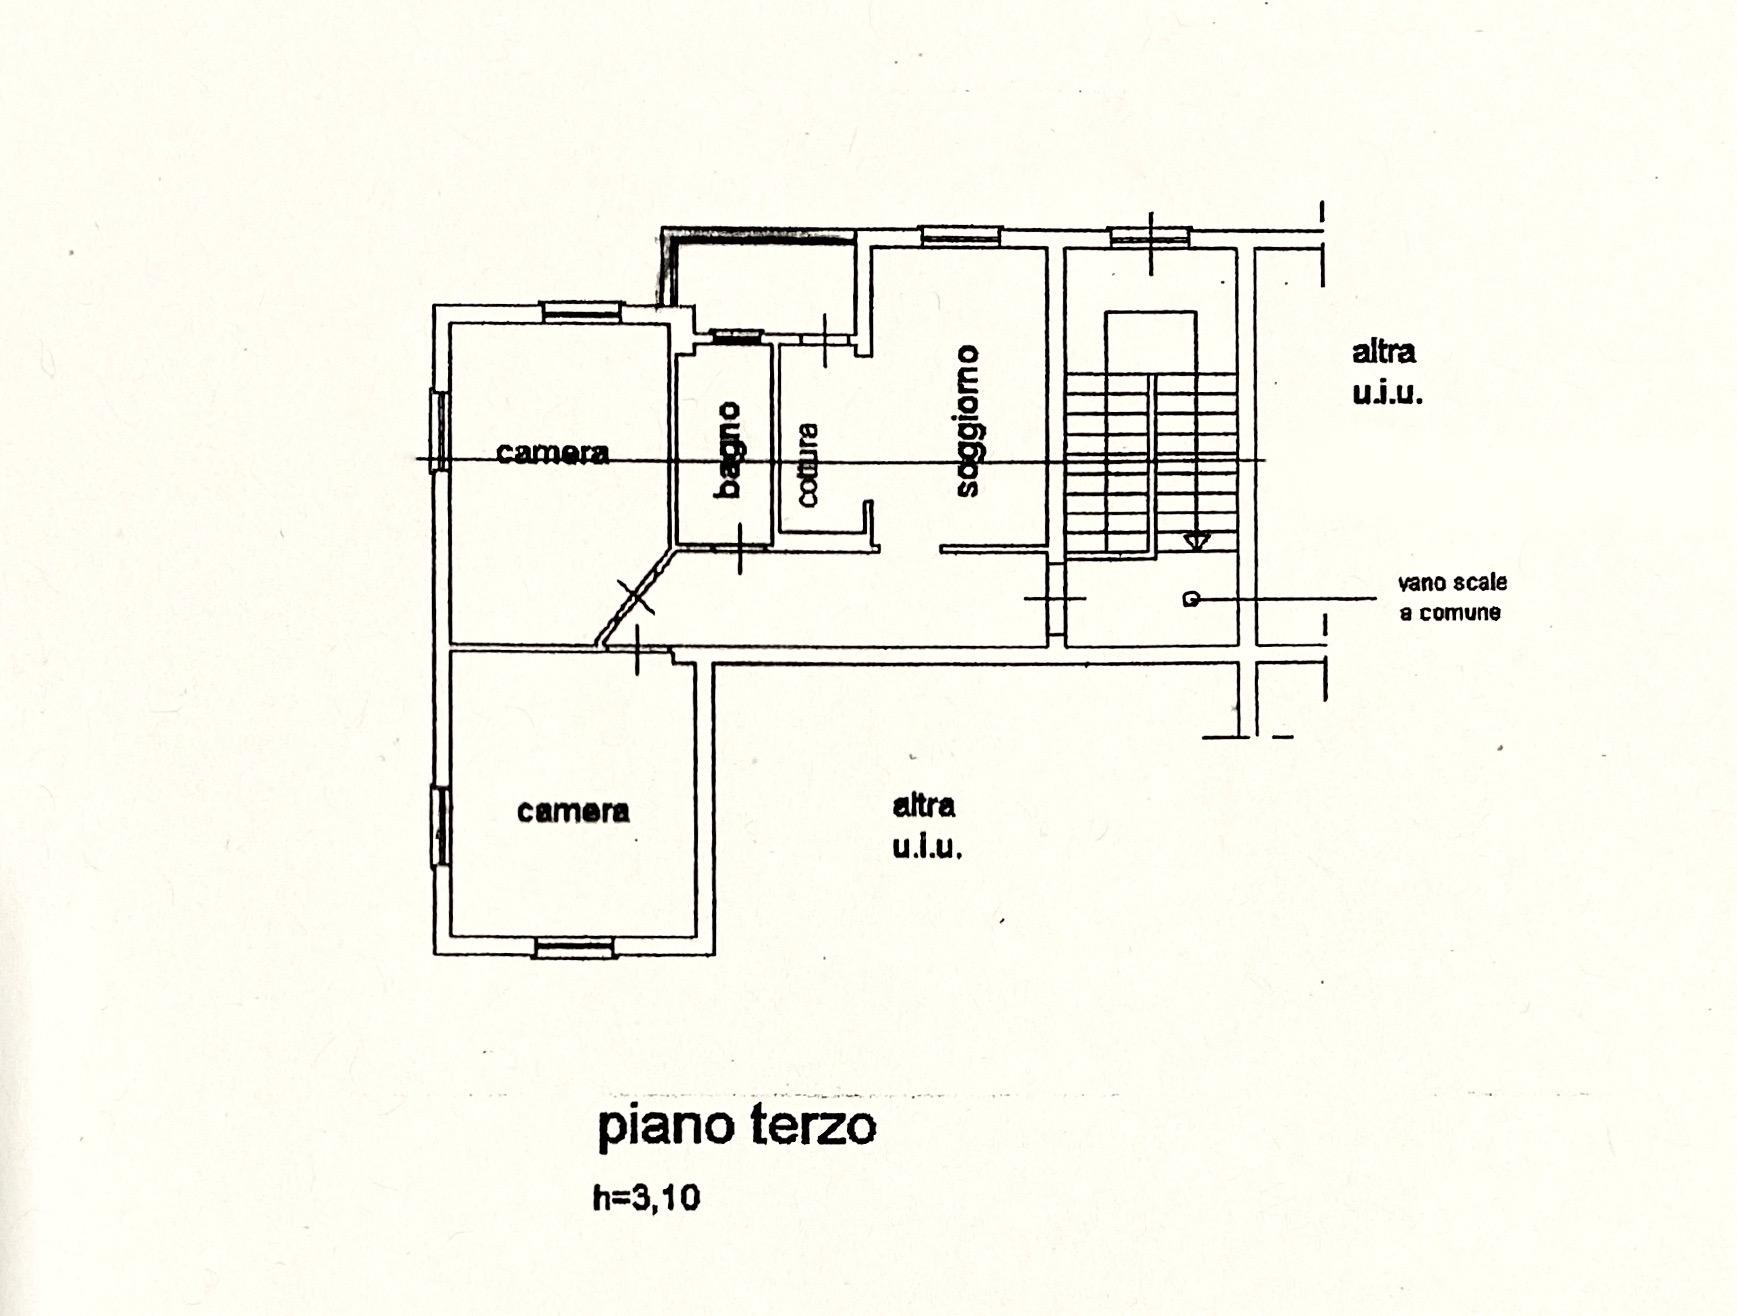 Appartamento in vendita, rif. LOG-521 (Planimetria 1/1)